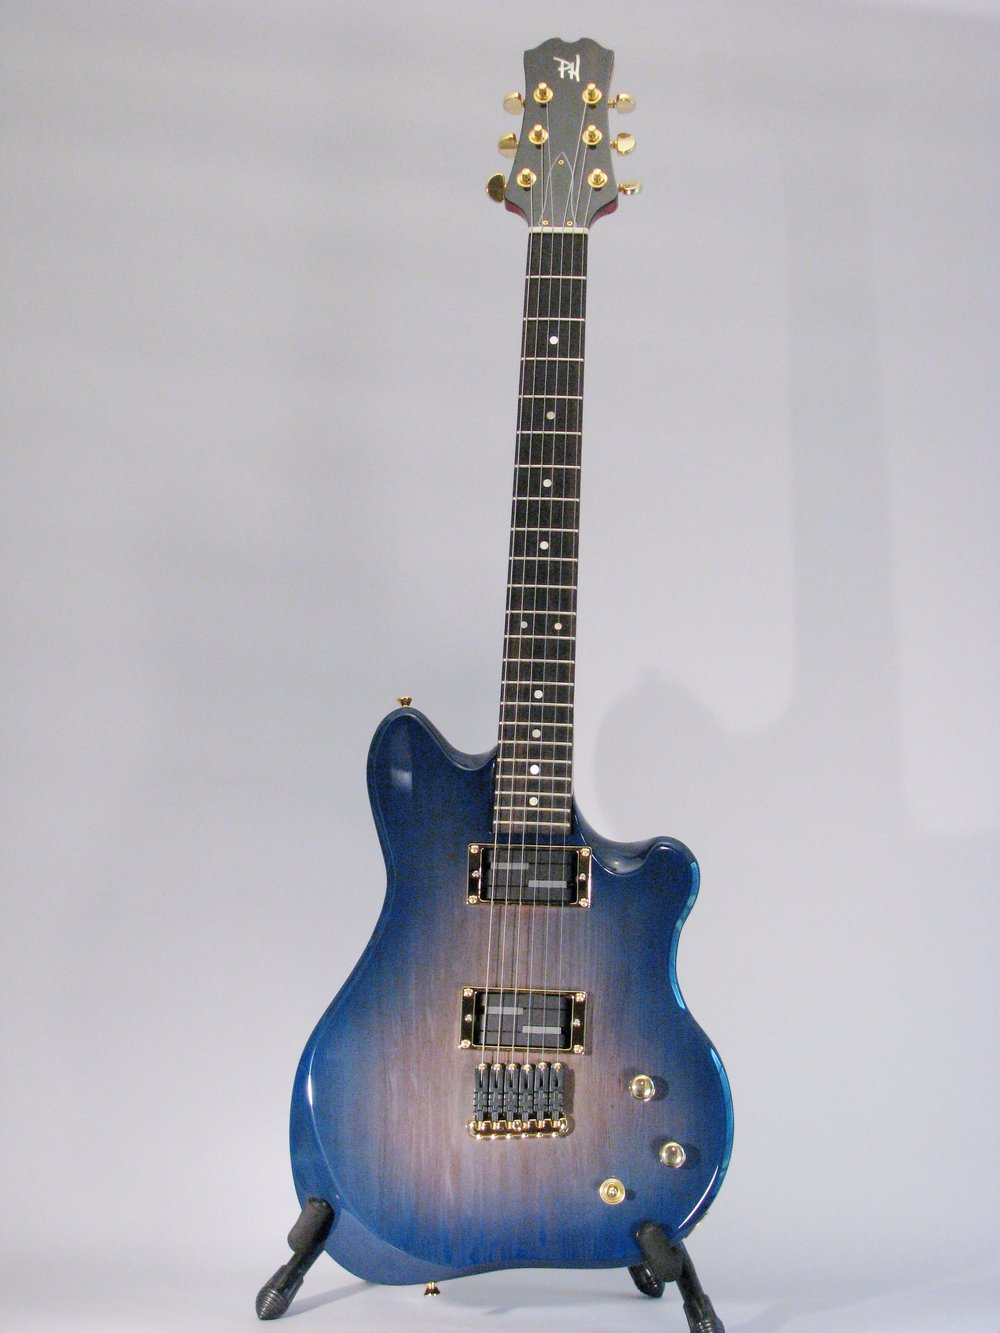 Tom's Blue